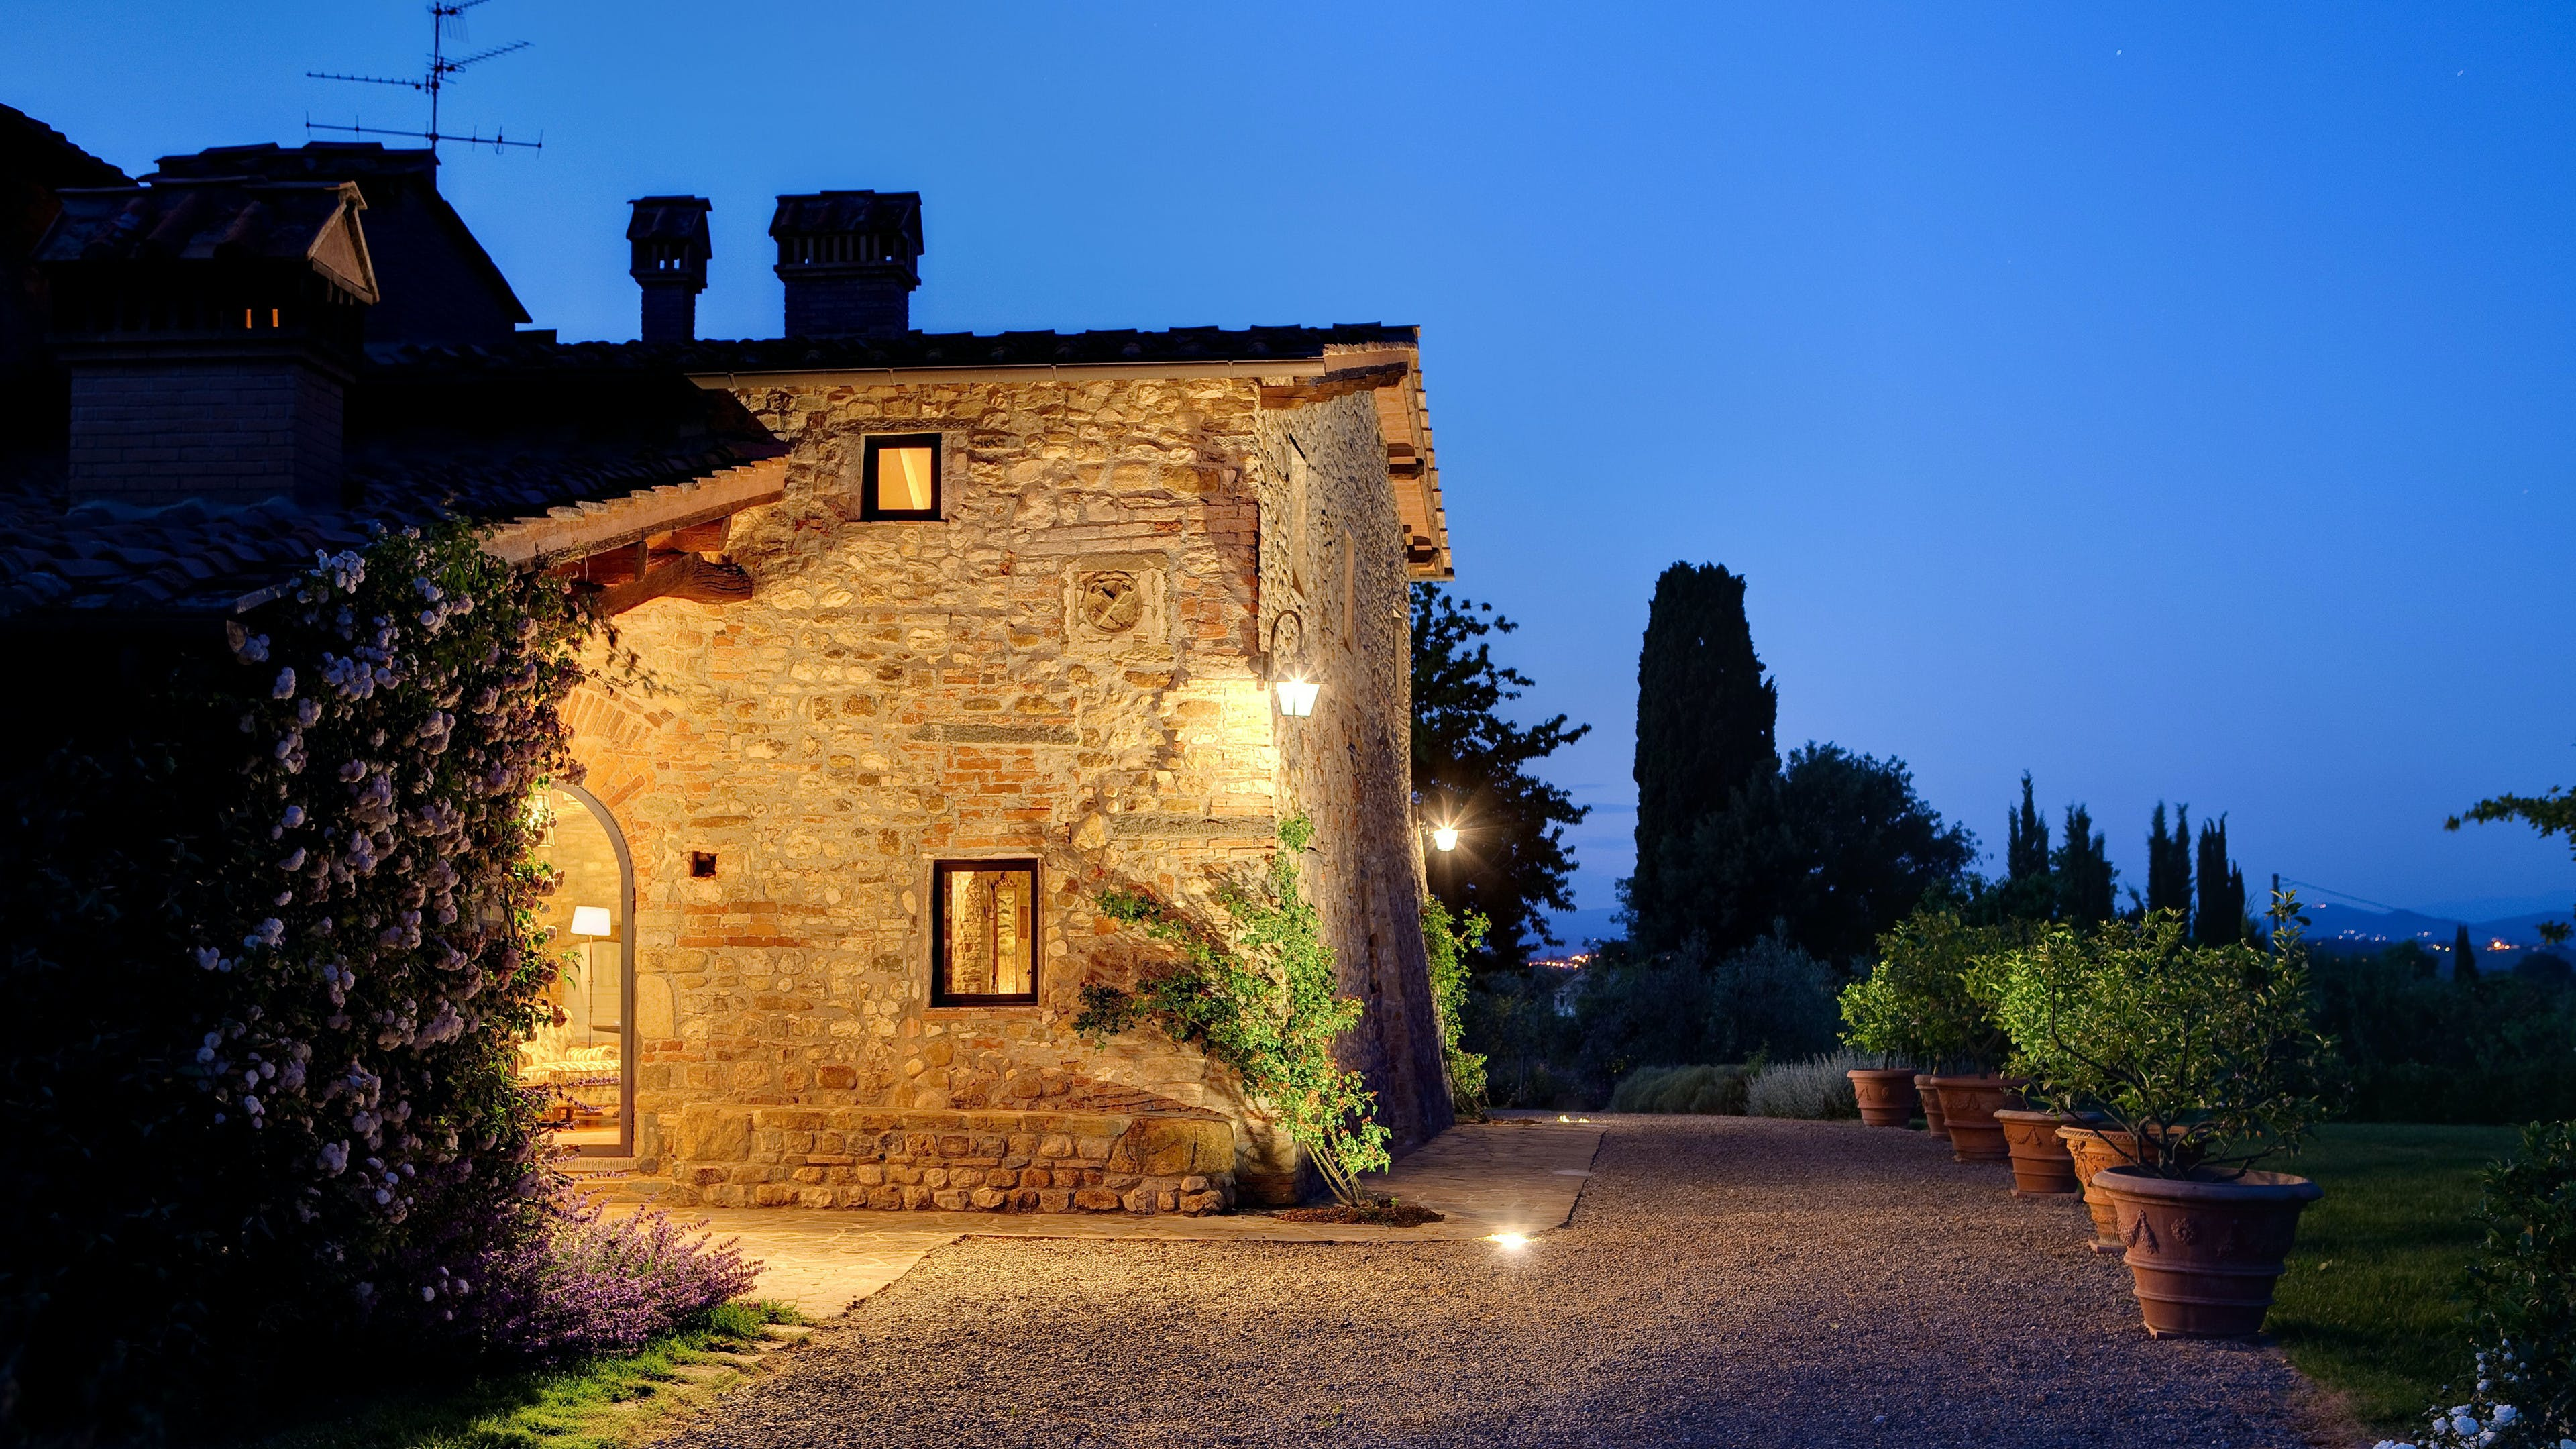 Villa Coventino, Italy -  - New York City Townhouse Real Estate